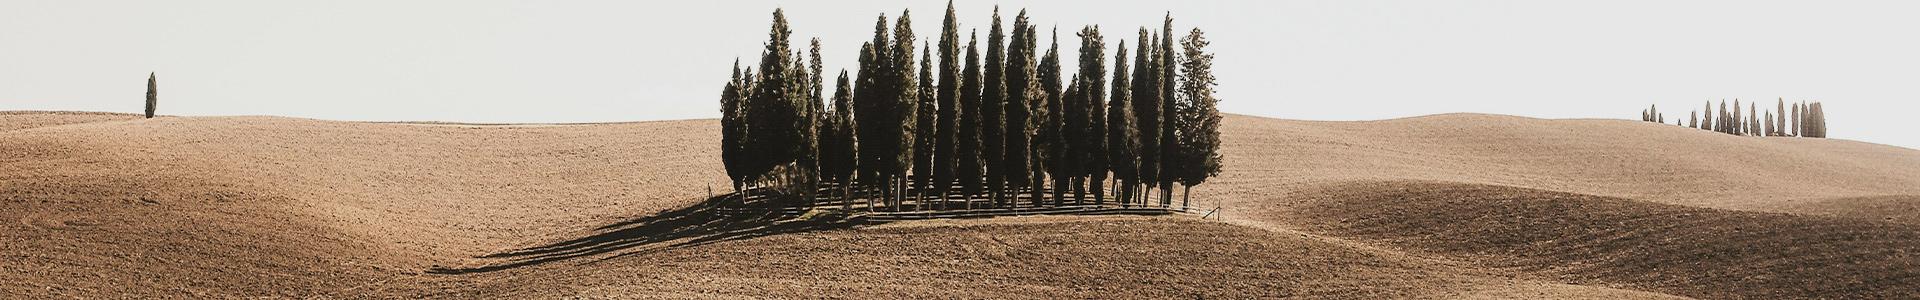 Borghi Toscana